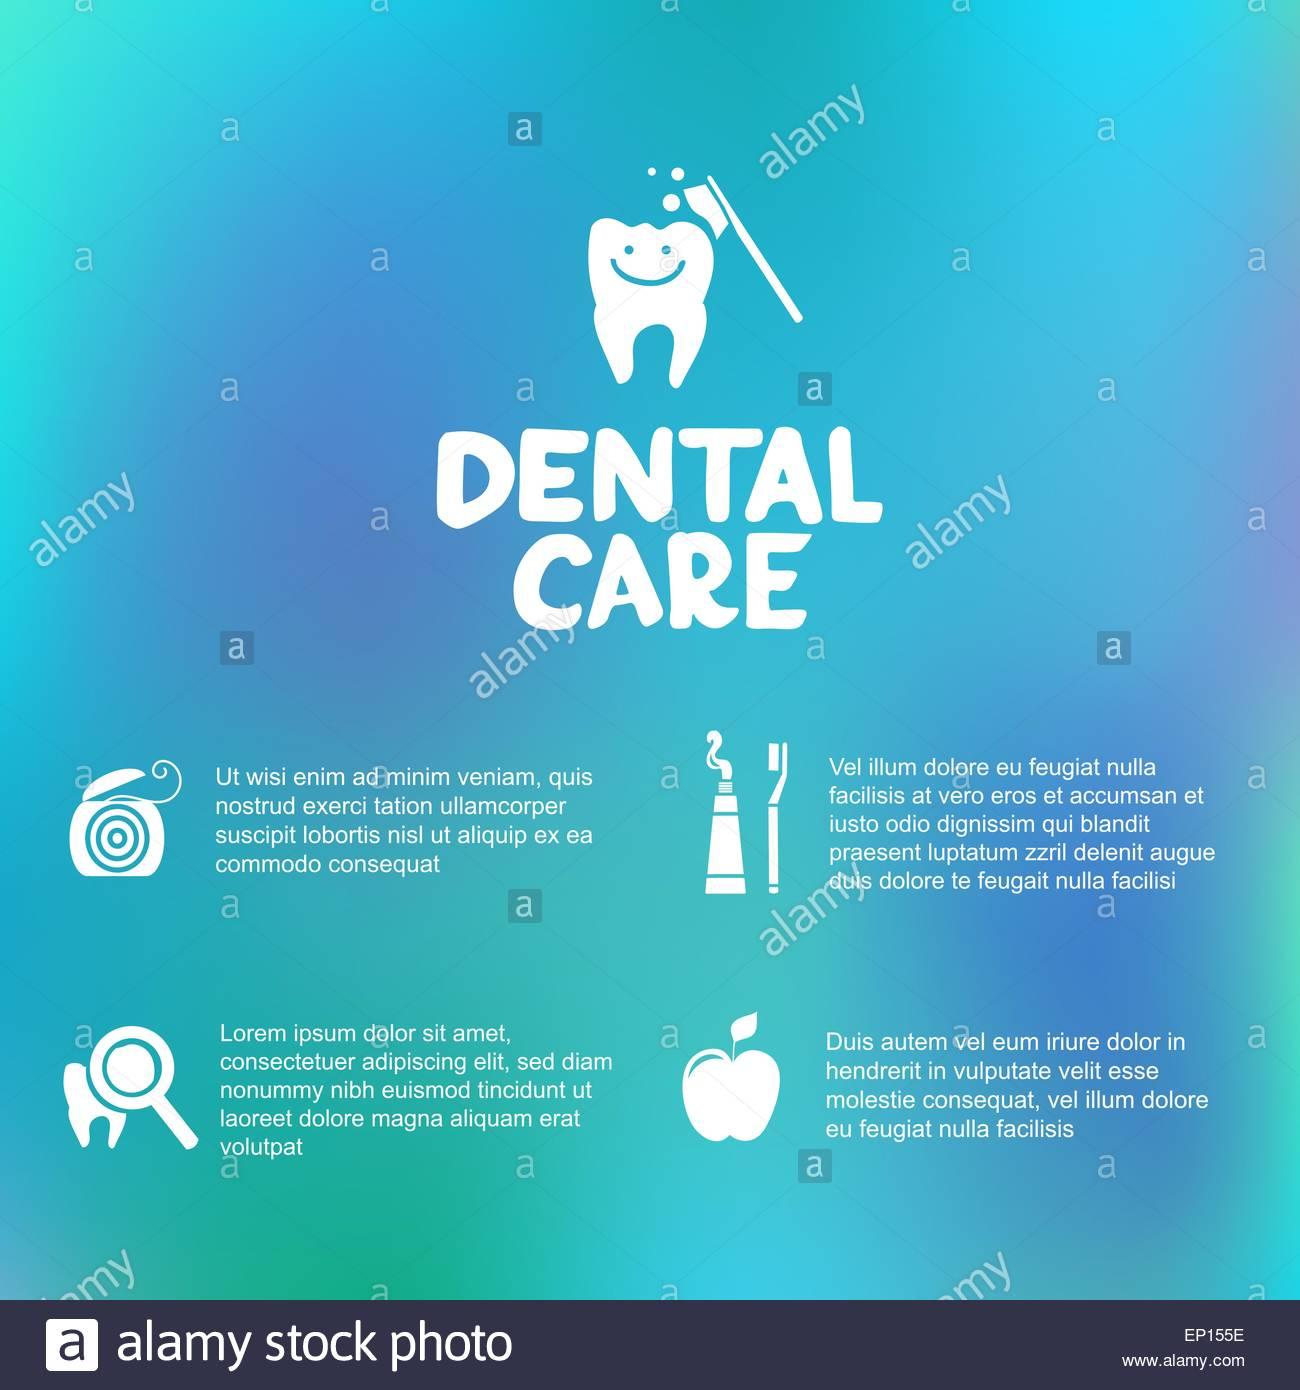 dental-care-simple-infographics-EP155E.j